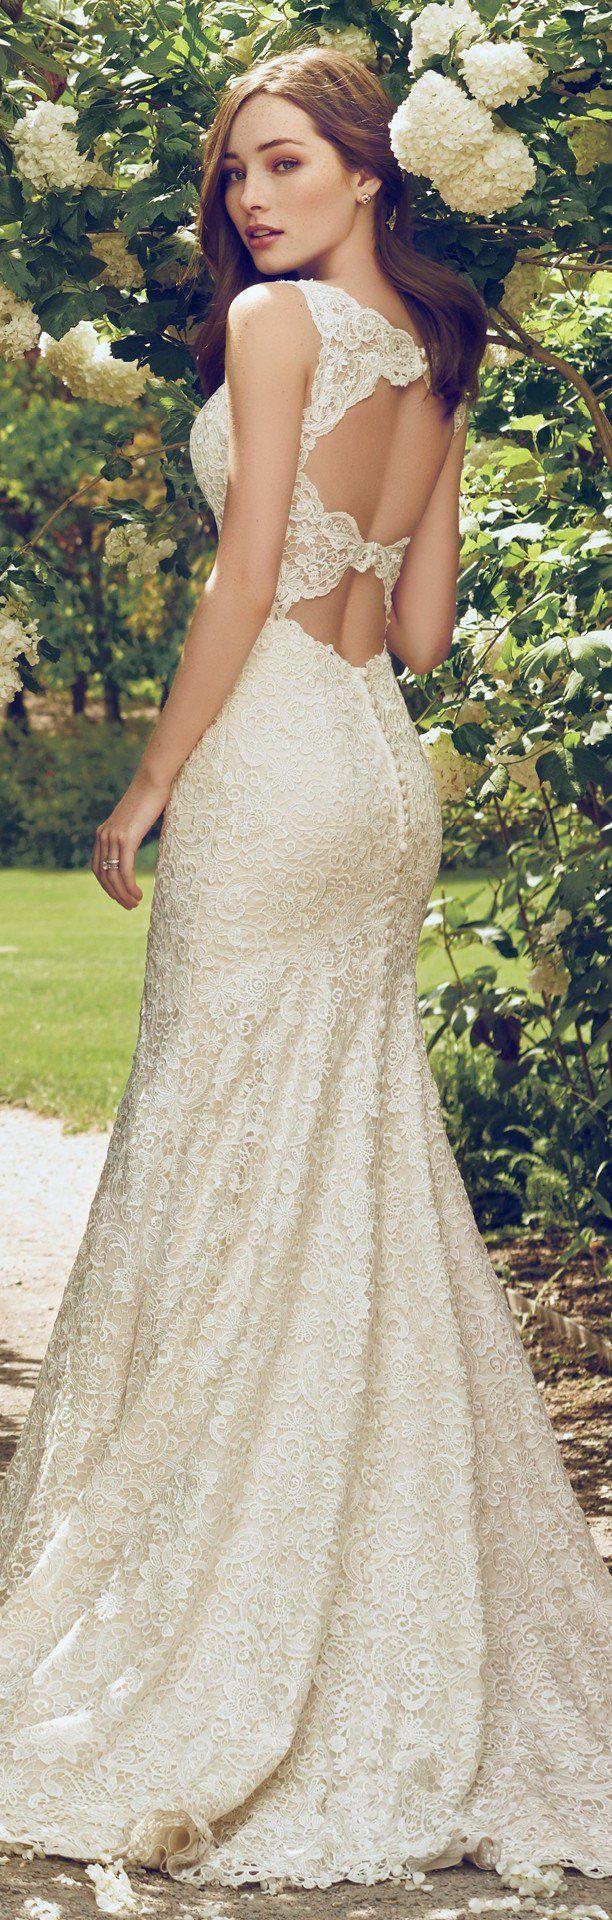 Best 25 open back wedding dress ideas on pinterest lace wedding wedding dress by rebecca ingram hope less than 1000 rebeccaingram rebeccabride junglespirit Images